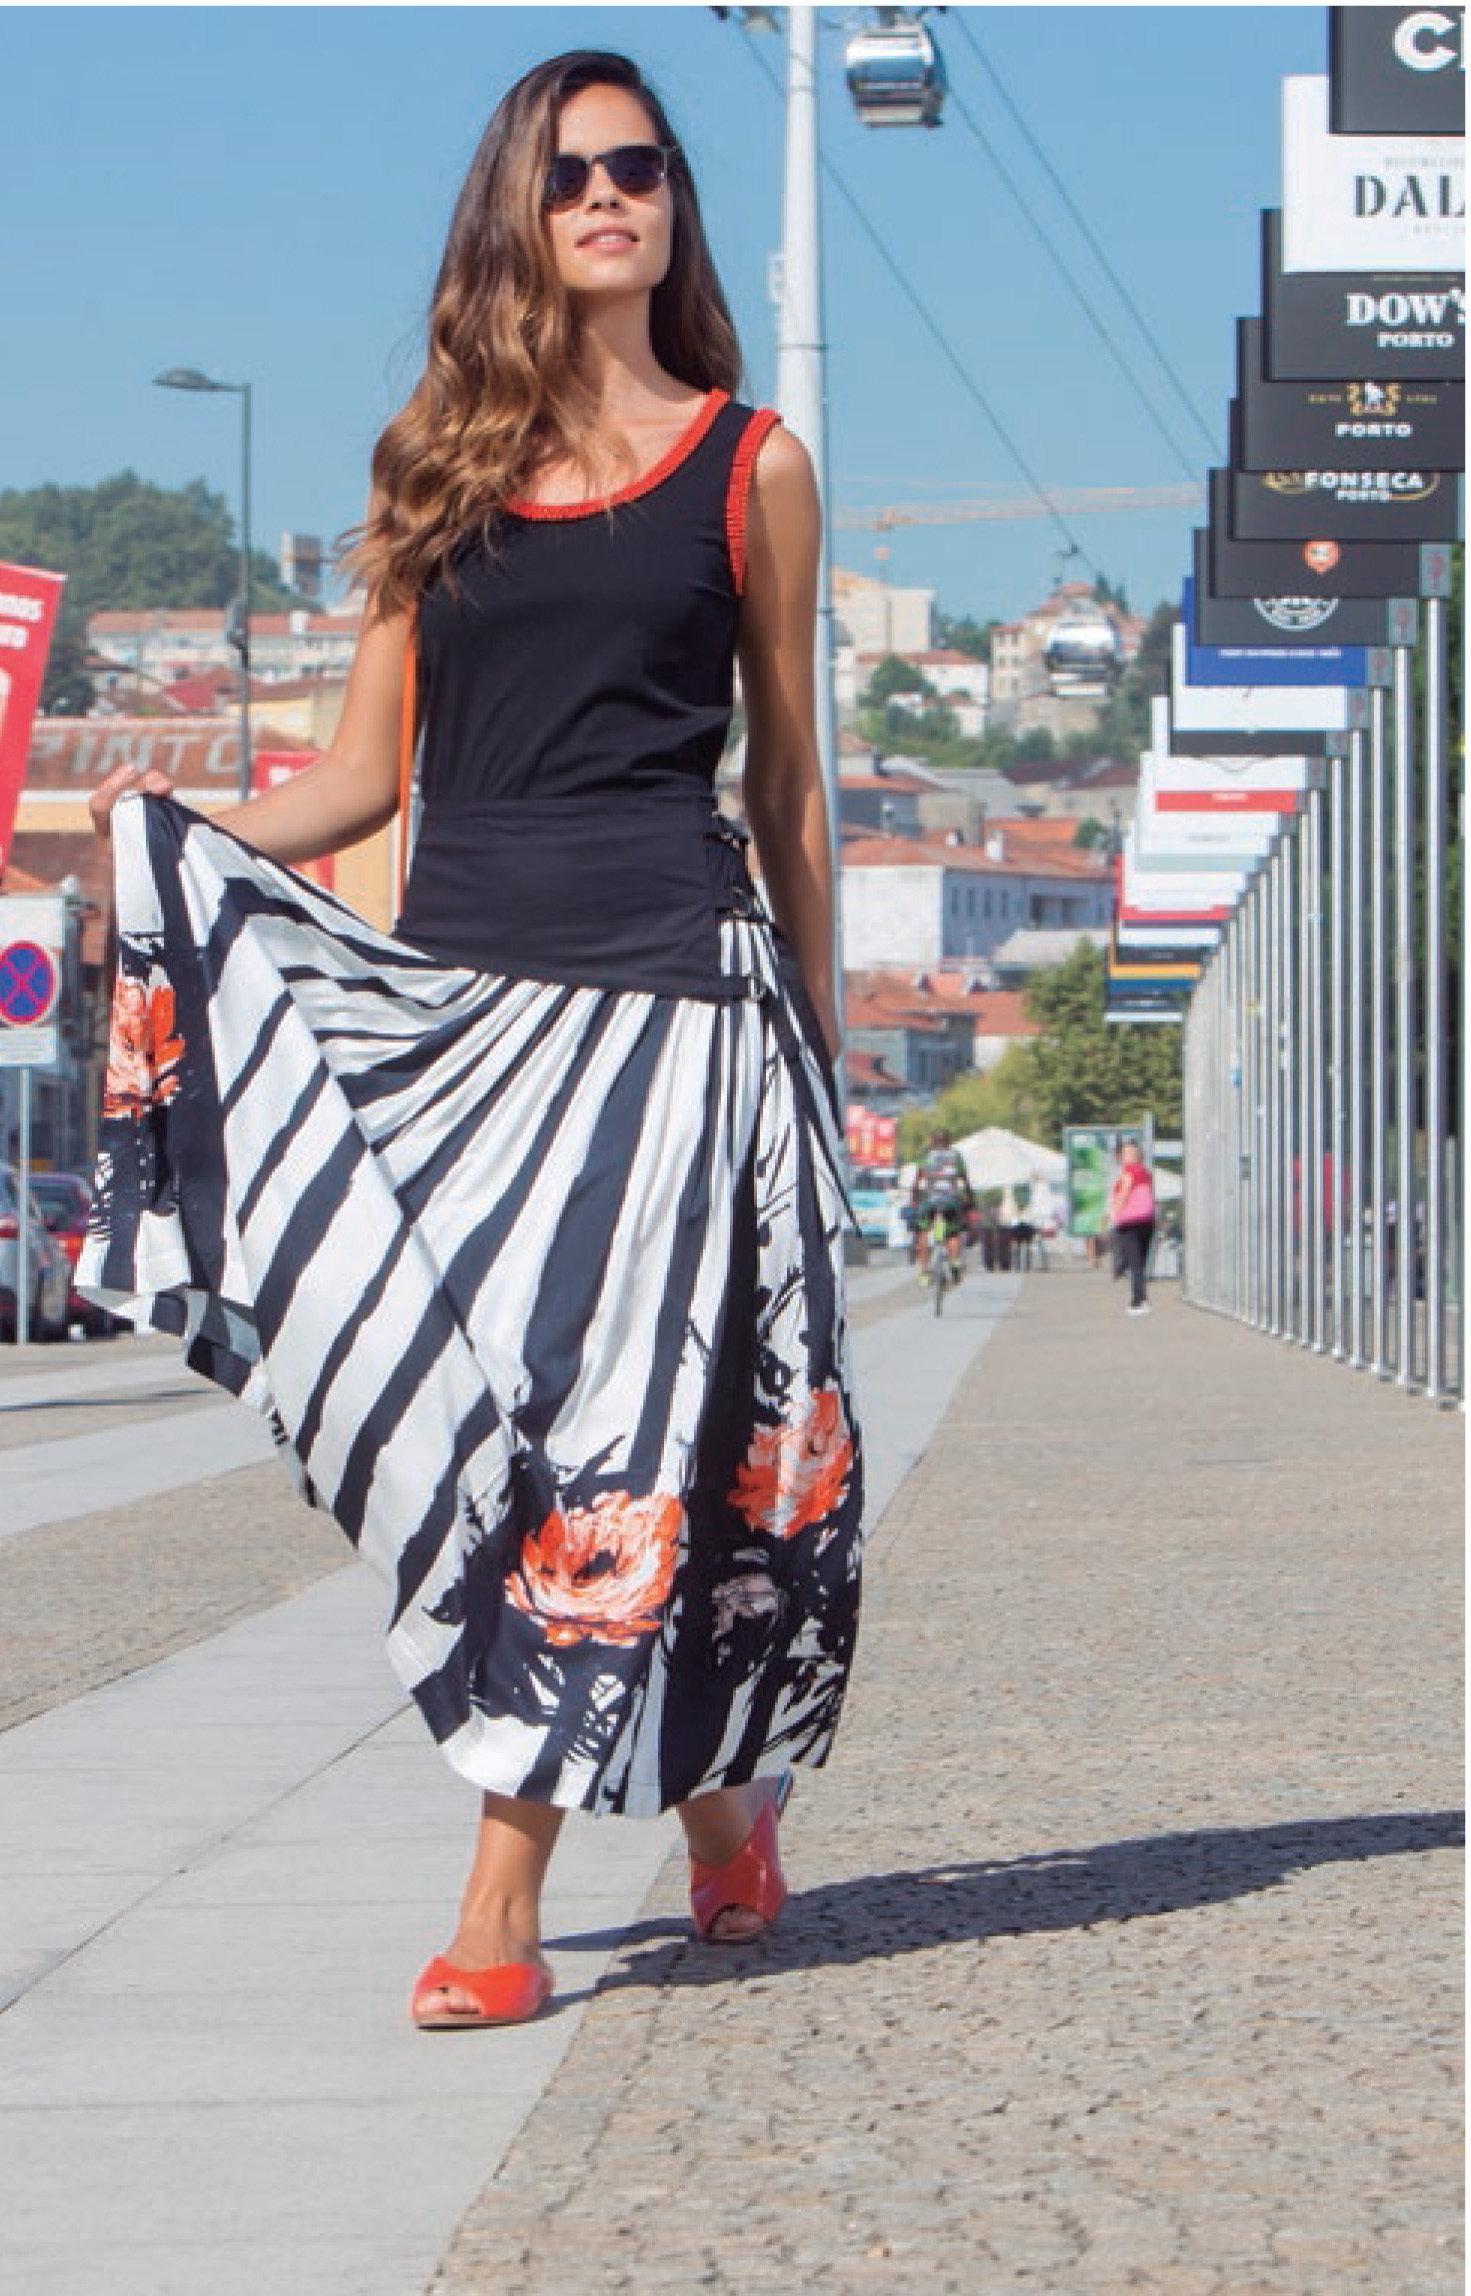 Paul Brial: Wild Orange Rose Corset Waist Flared Tuxedo Skirt (1 Left!) PB_RECTO_N2